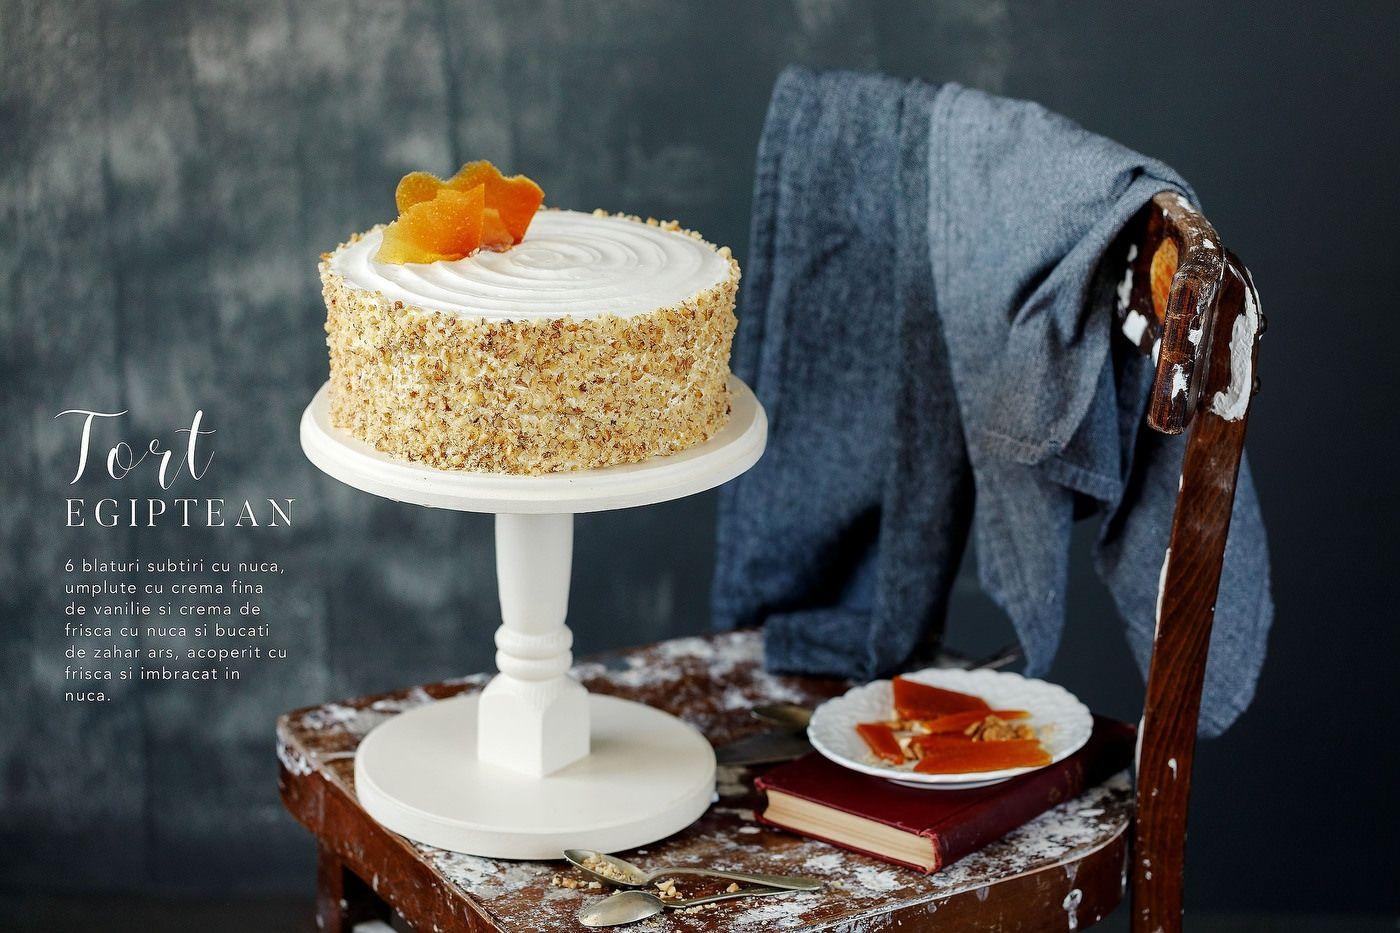 Tort egiptean cu styling fotografie de produs